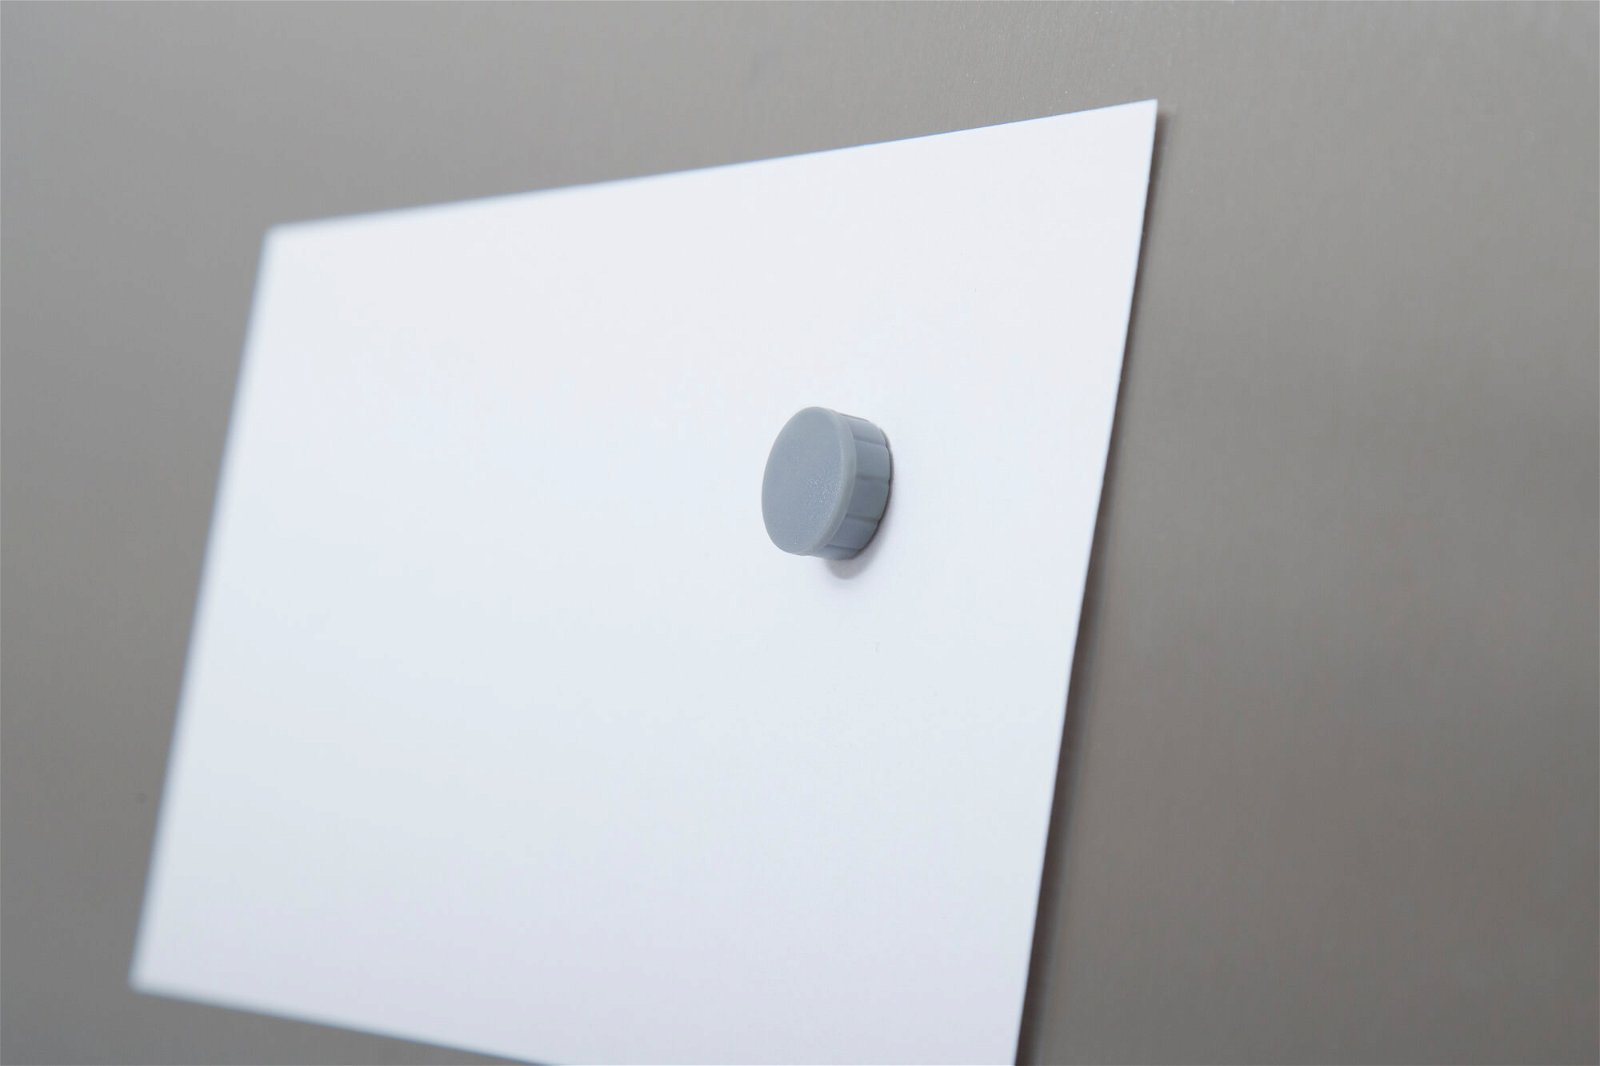 5Magnet MAULsolid Ø 15 mm, 0,15 kg Haftkraft, 10 St/Ktn., grau